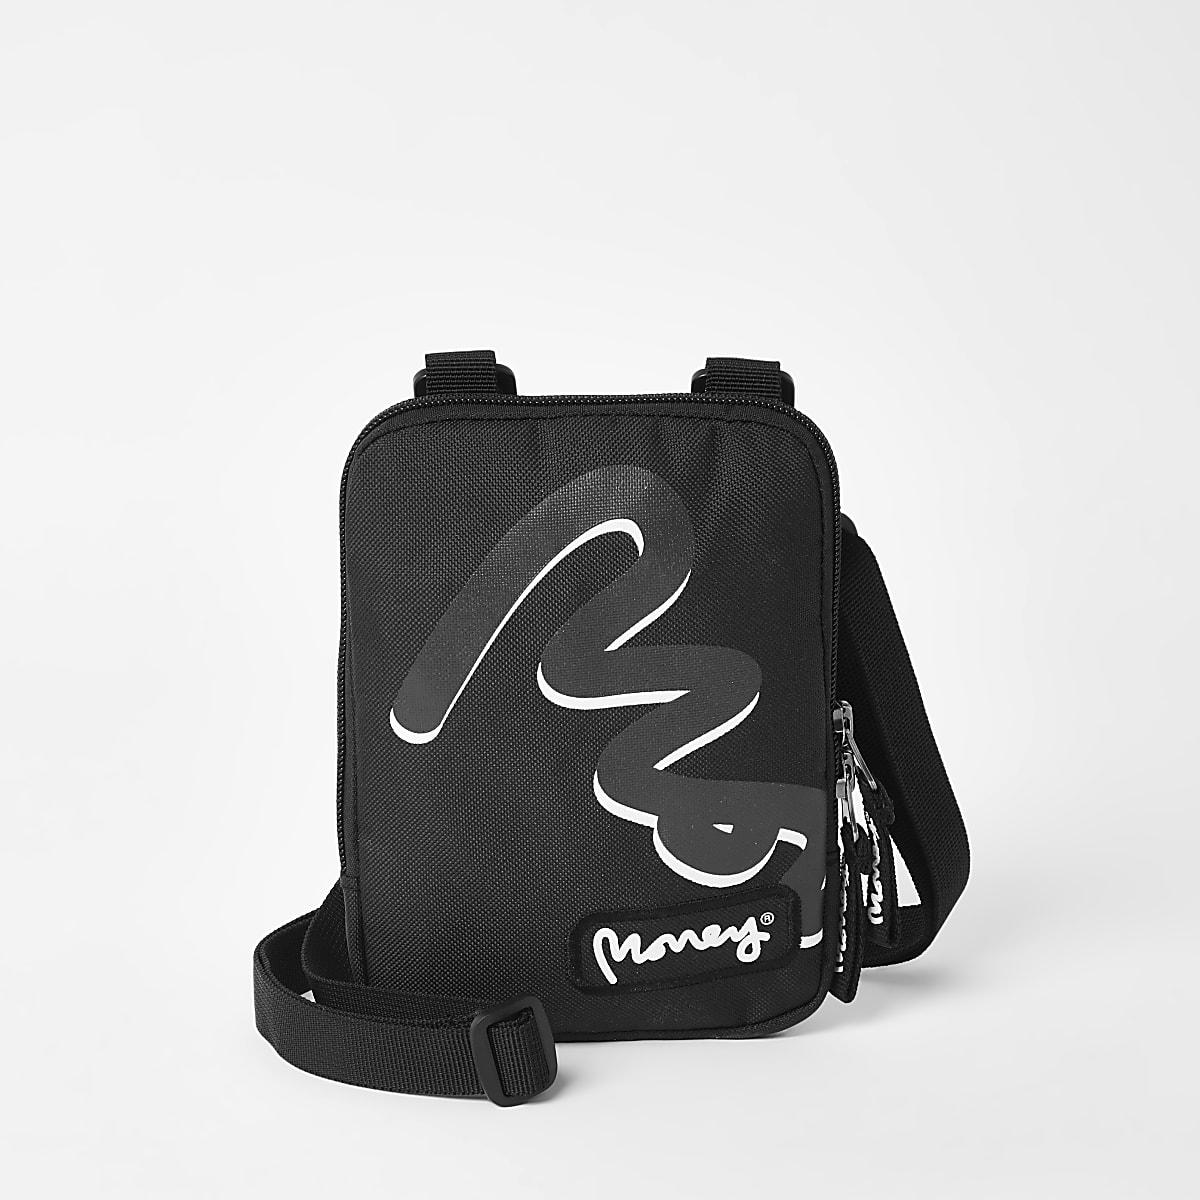 Boys black Money cross body travel bag